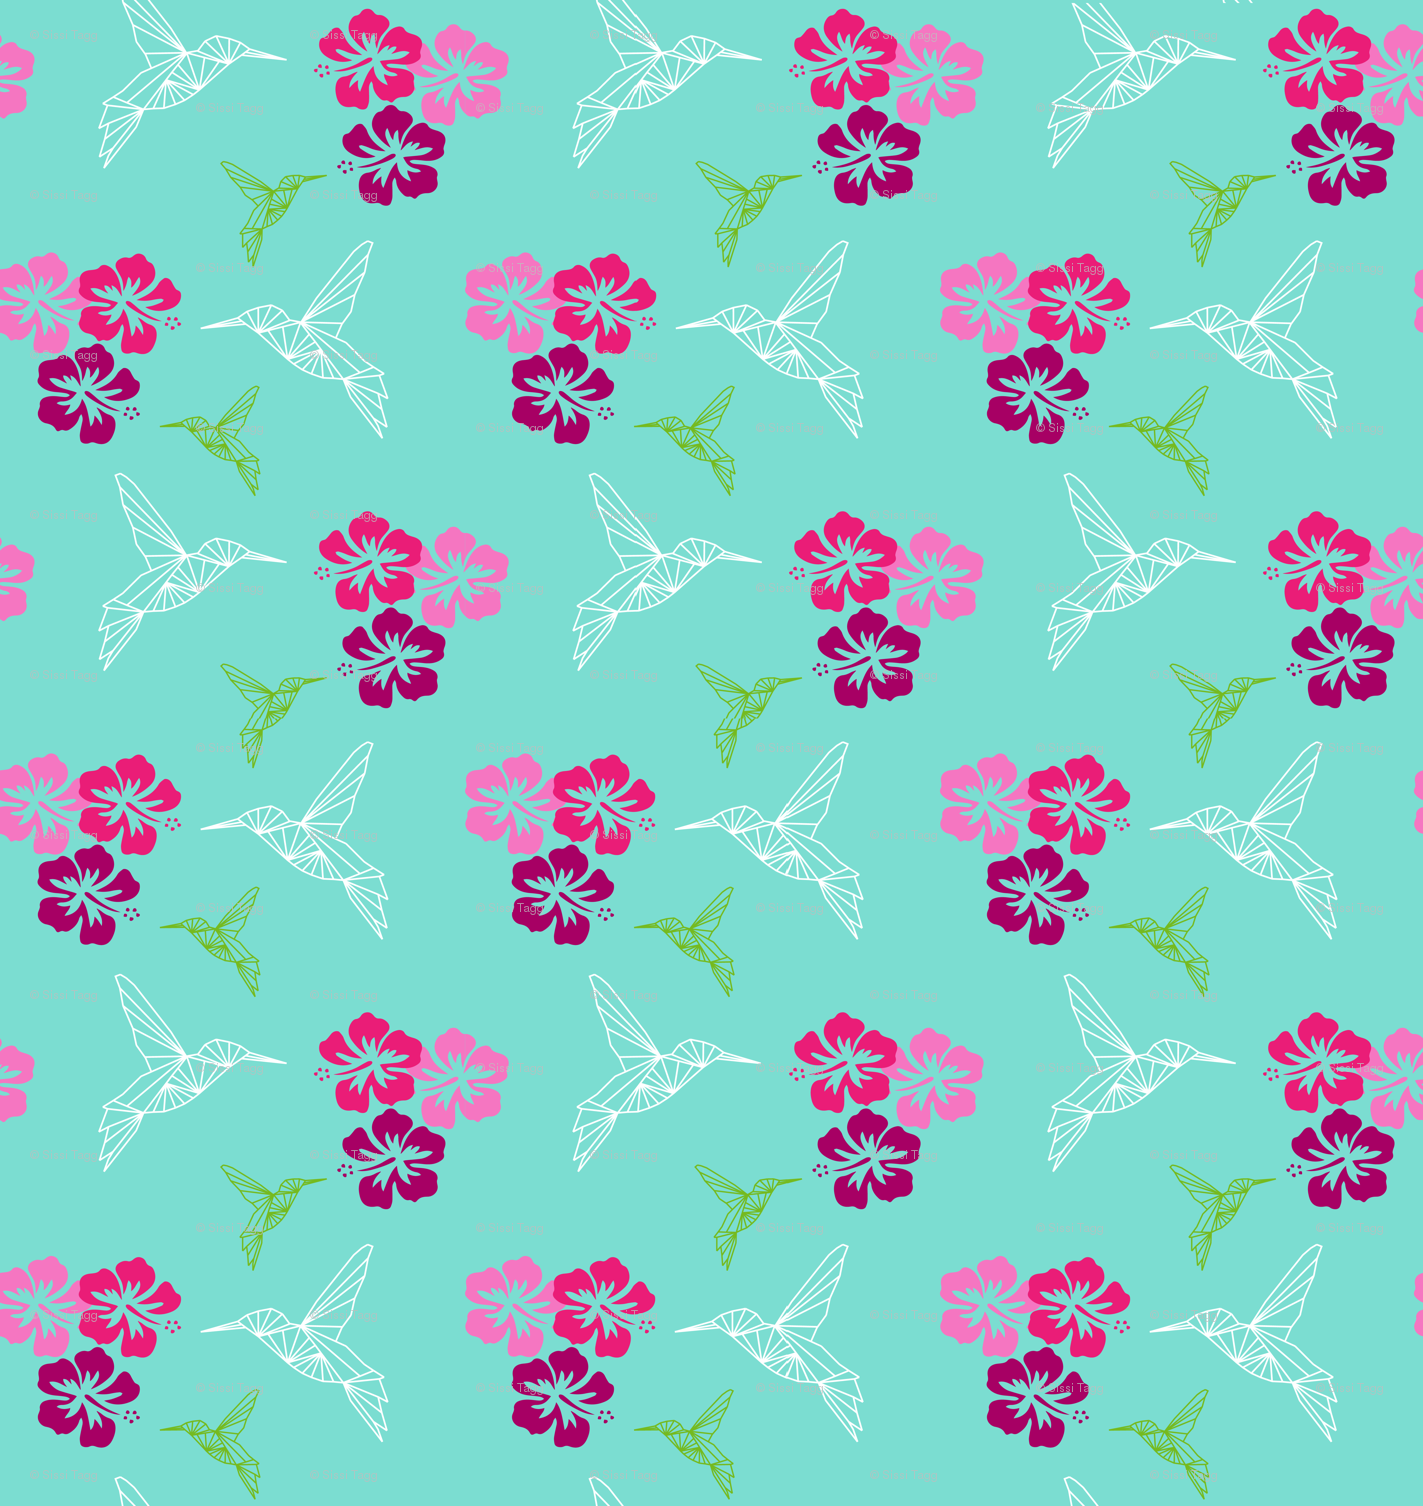 Colibri Hibiscus Antilles Wallpaper Sissi Tagg Spoonflower